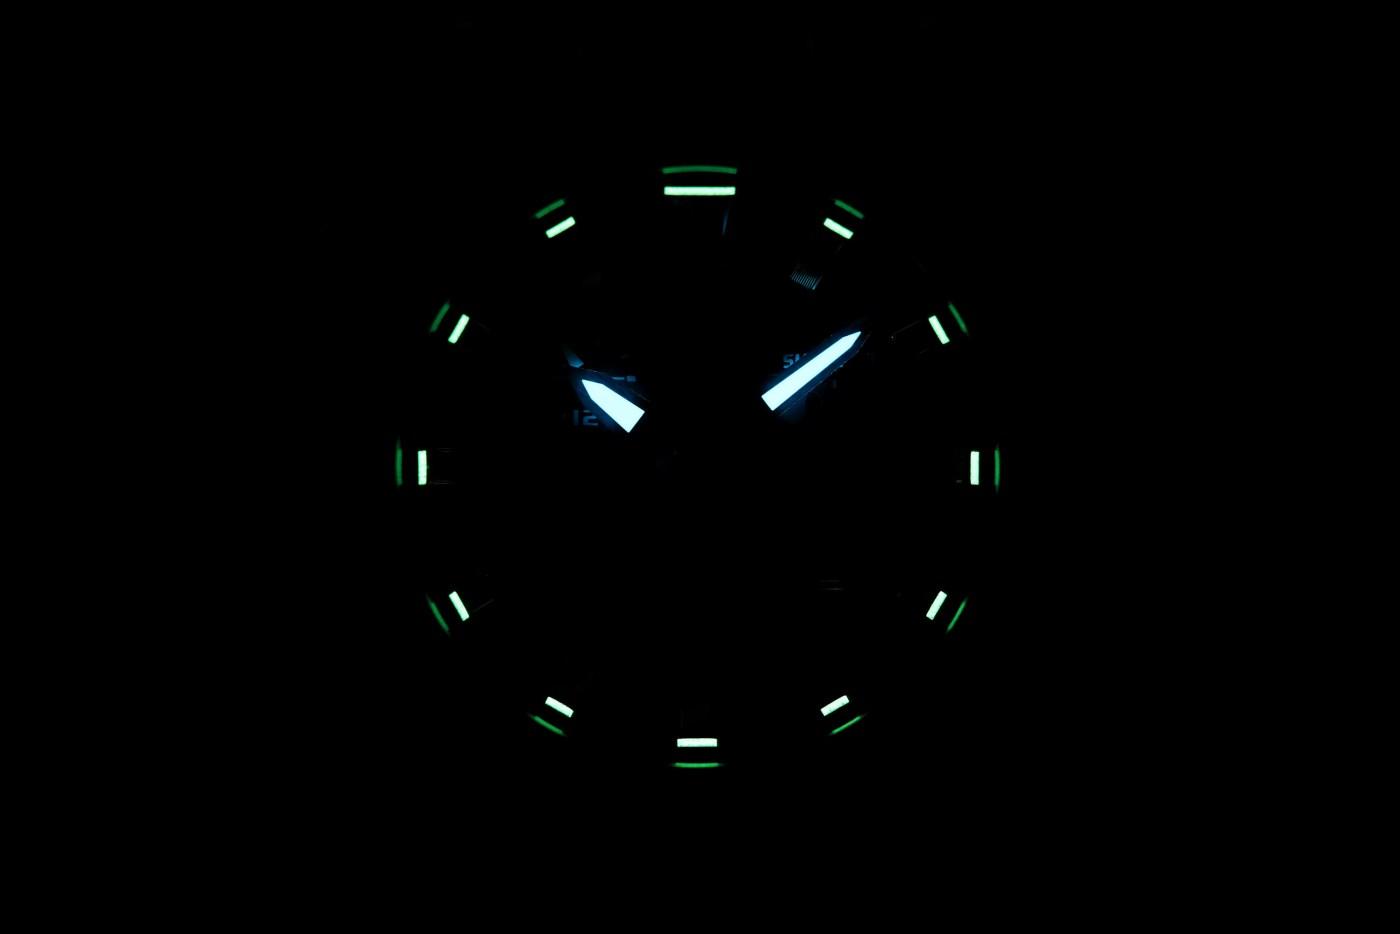 G-Shock MT-G MTGB2000D-1A lume